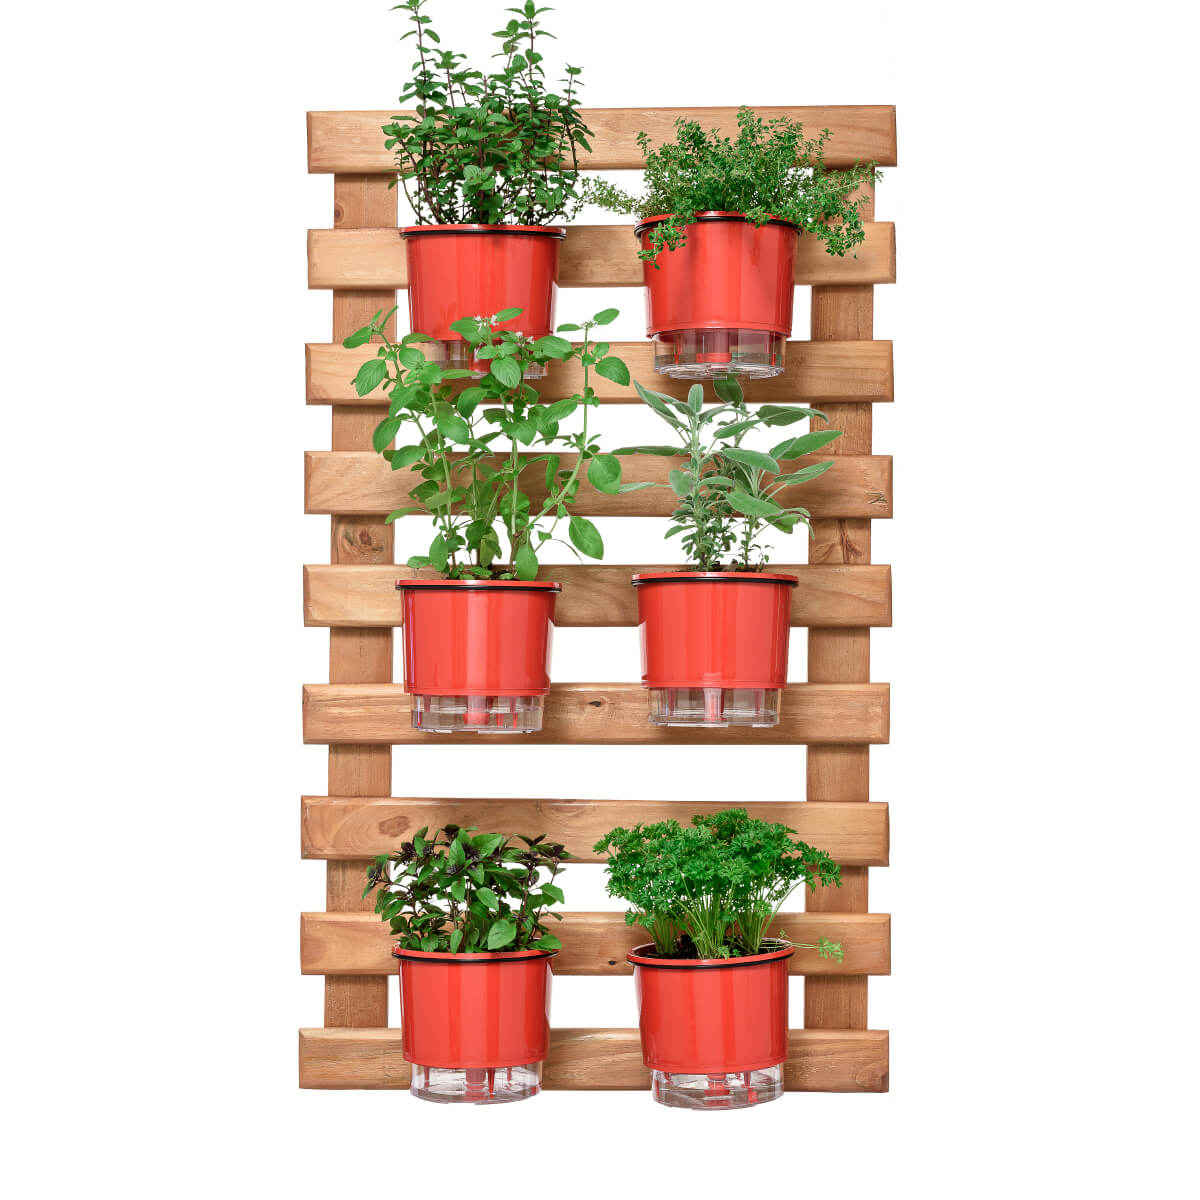 Kit Horta Vertical 60cm x 100cm com 6 Vasos Vermelhos  - Vasos Raiz Loja Oficial